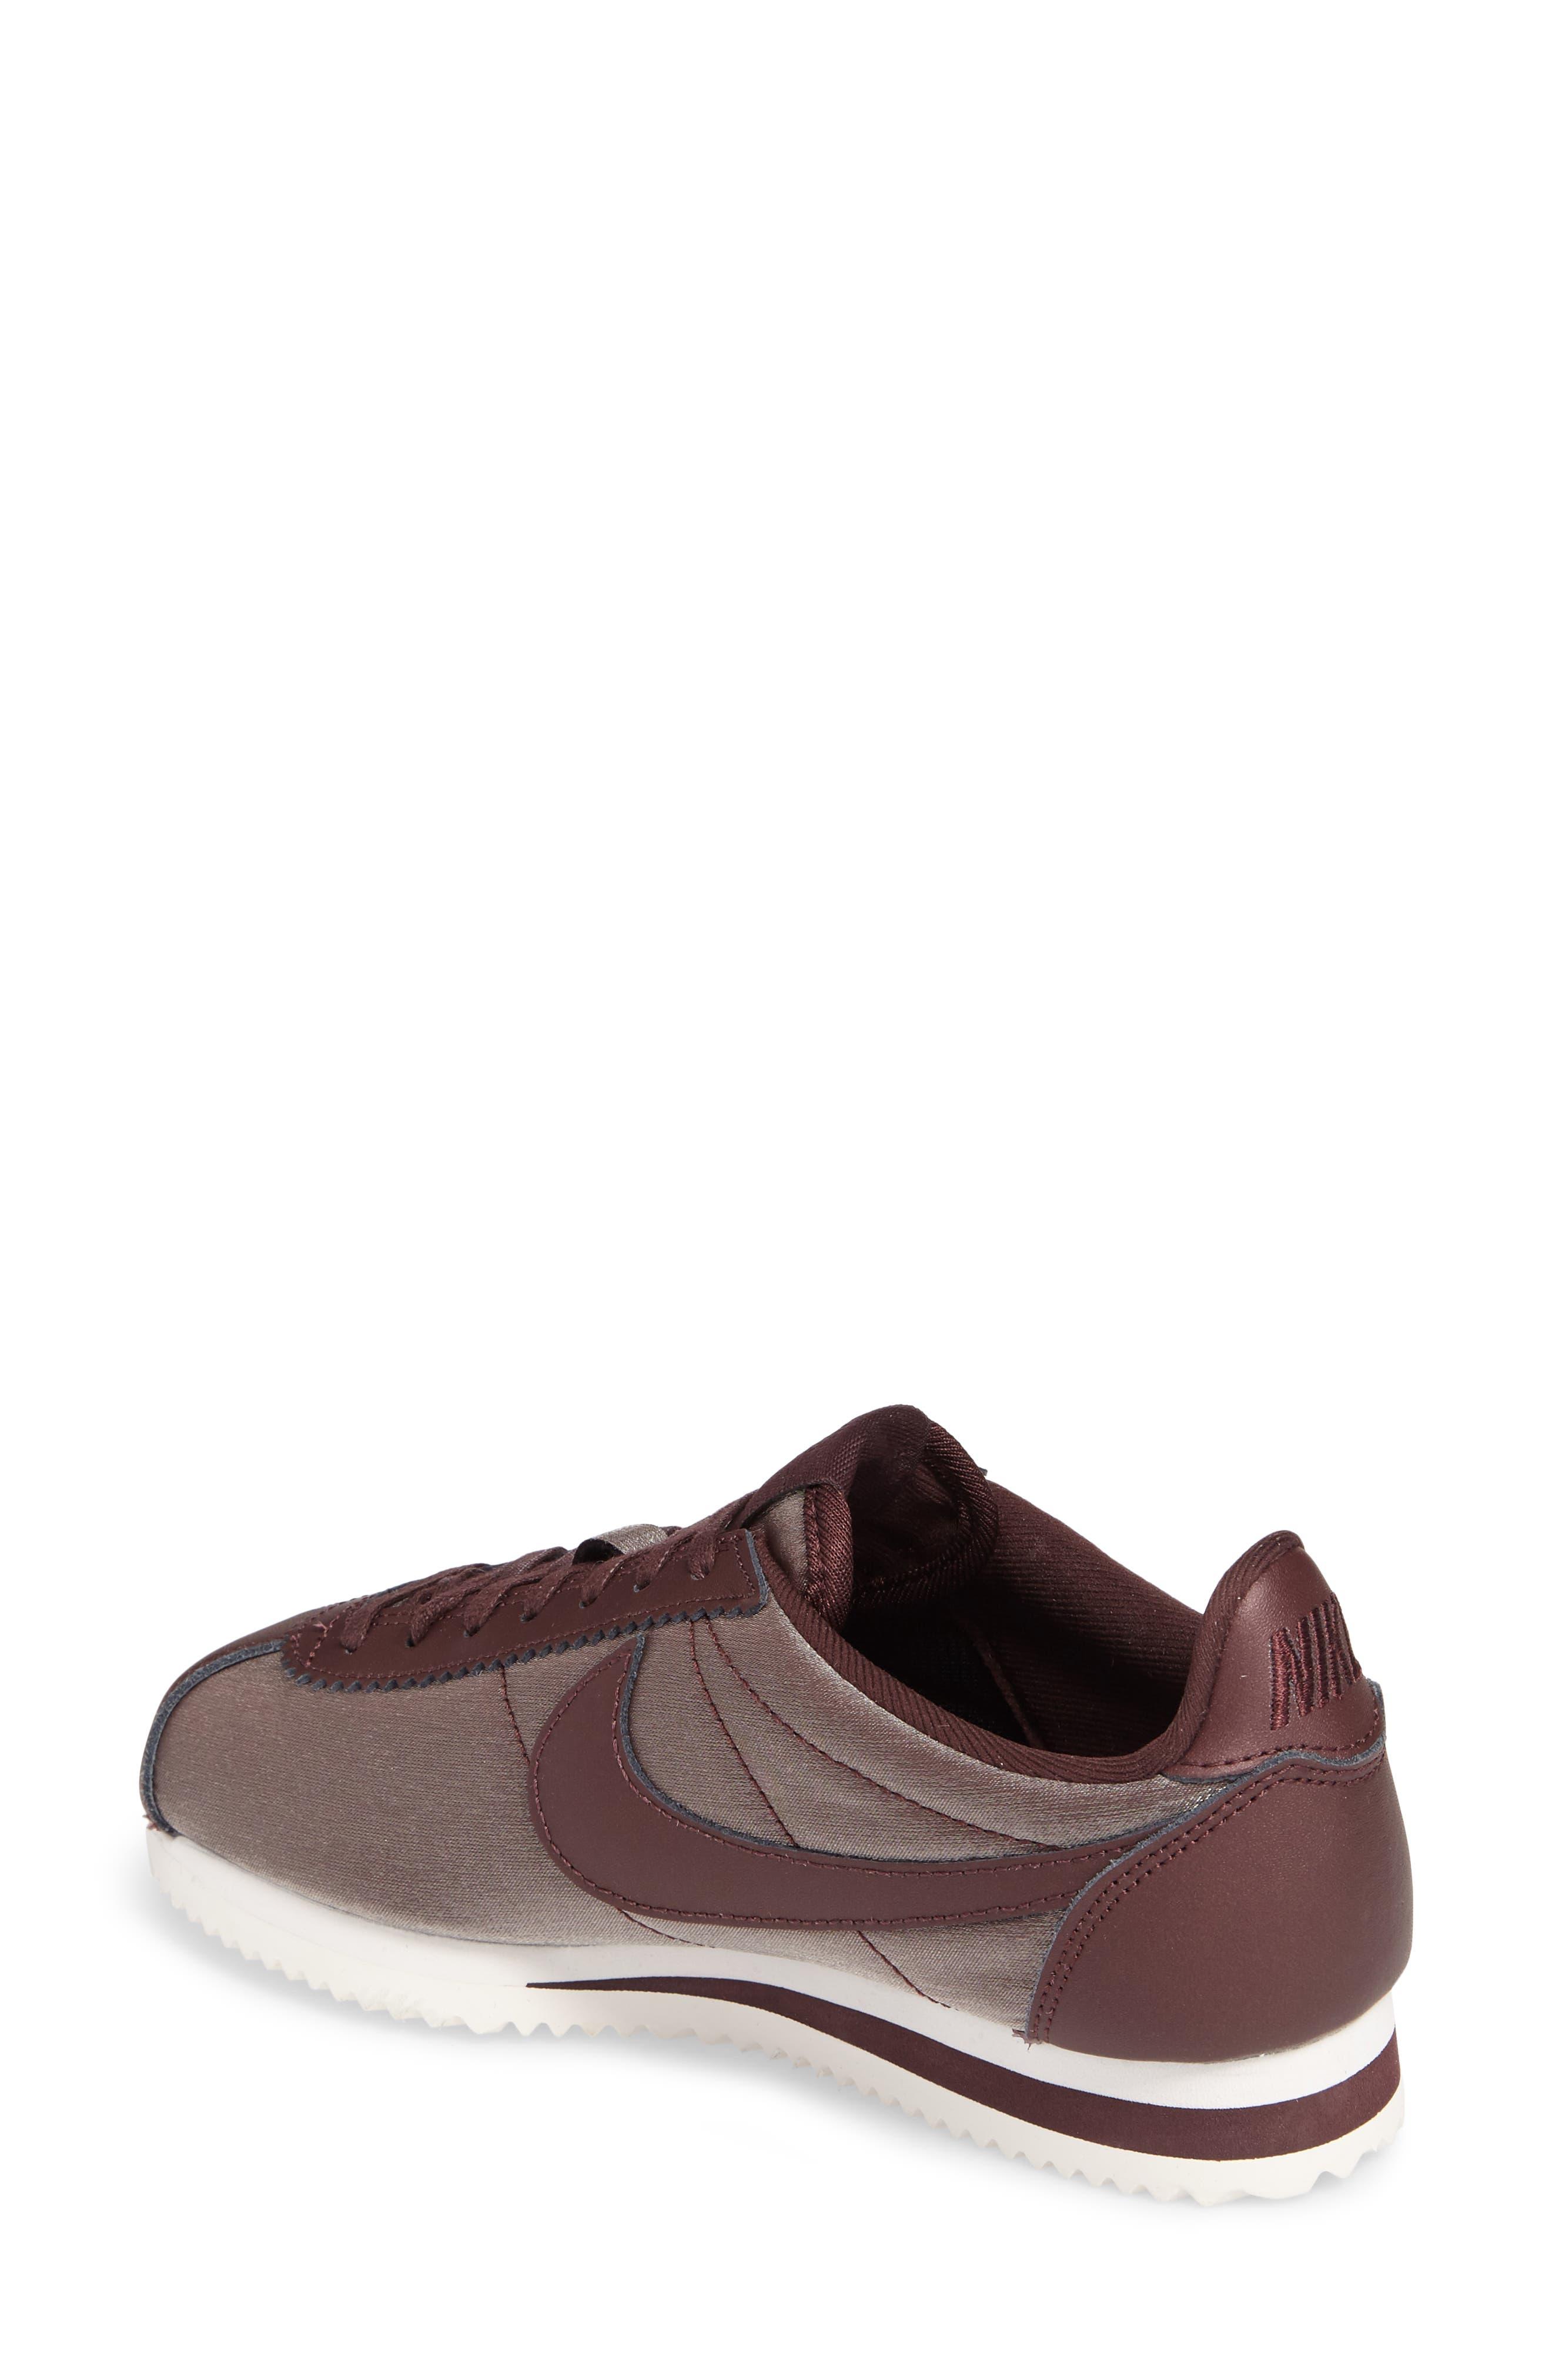 Classic Cortez Premium XLV Sneaker,                             Alternate thumbnail 2, color,                             Mahogany/ Mahogany/ White